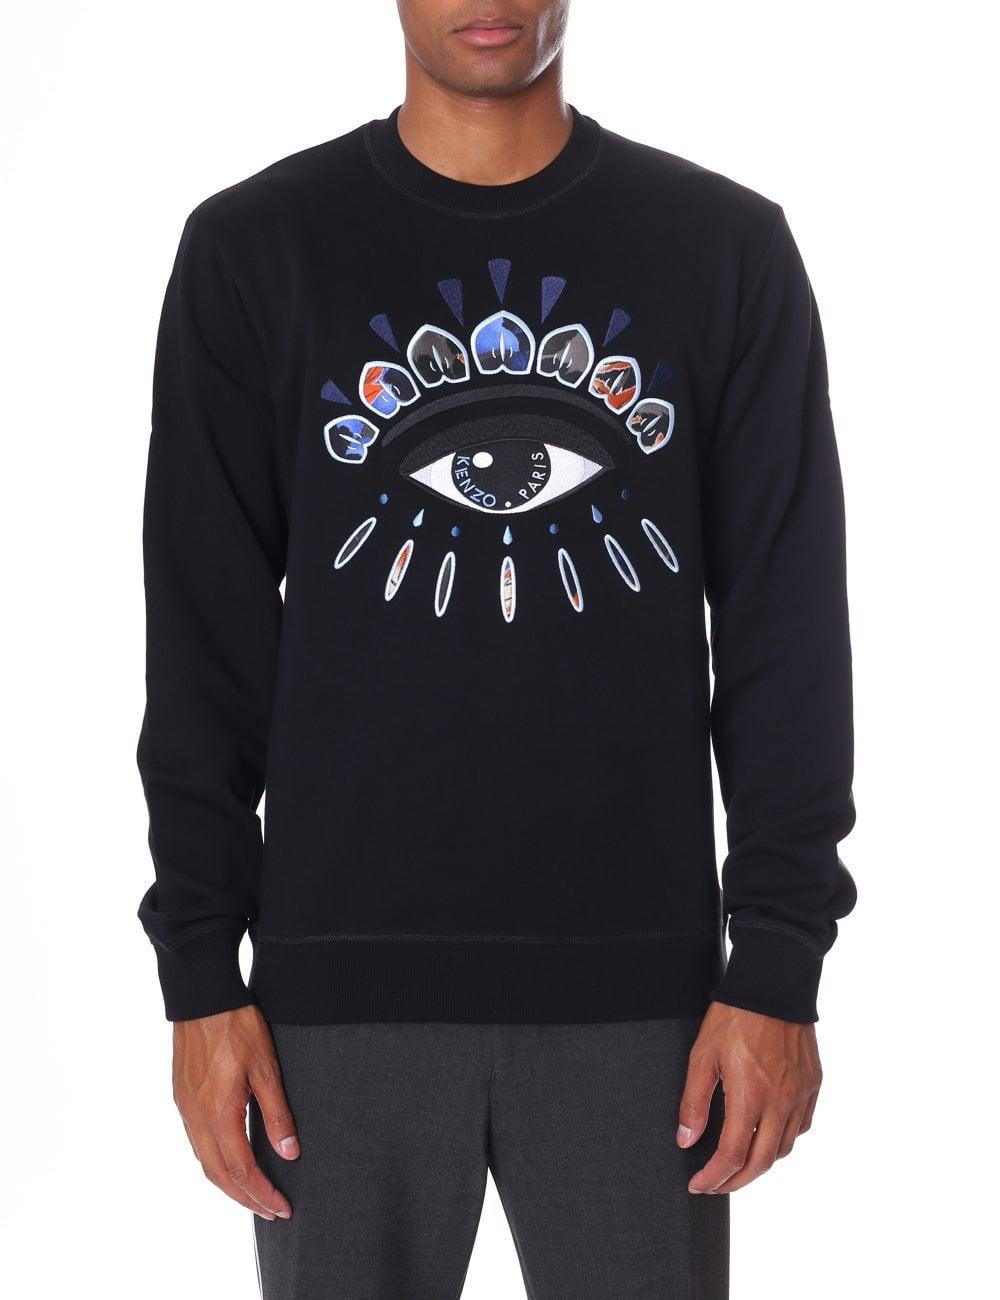 0de4b764387a Kenzo Men's Indonesian Flow Eye Sweatshirt